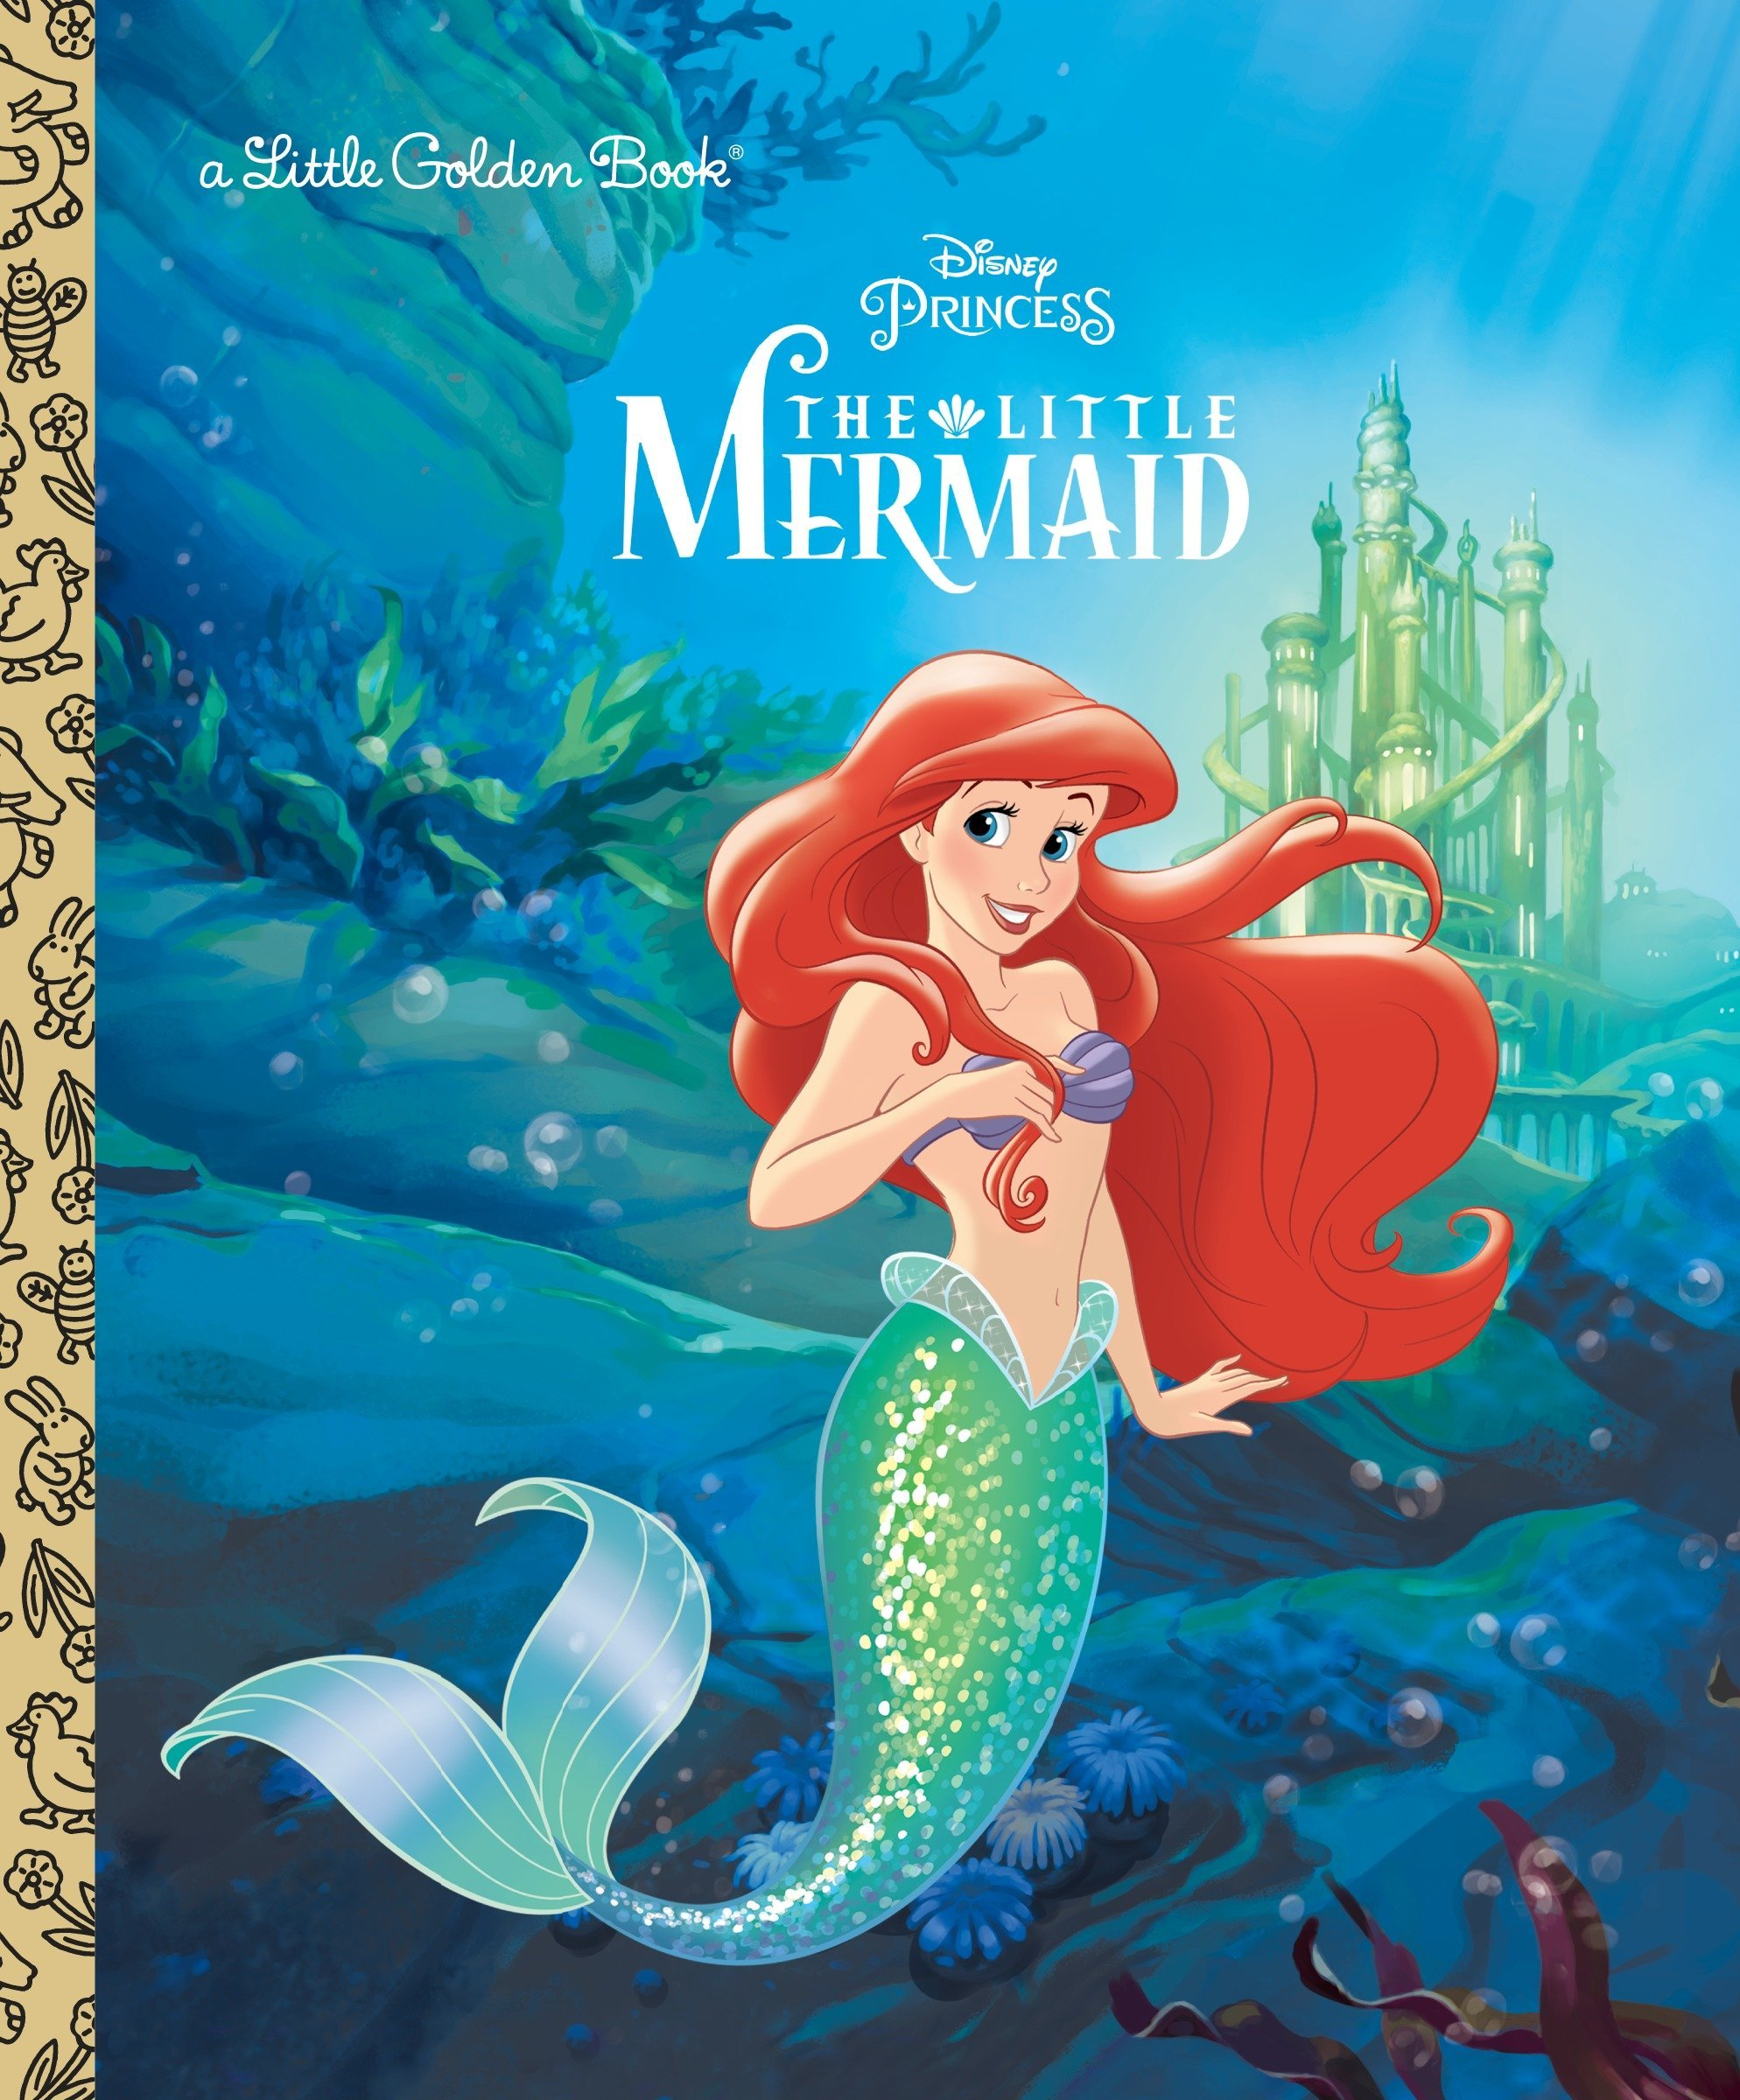 Disney Princess The Little Mermaid